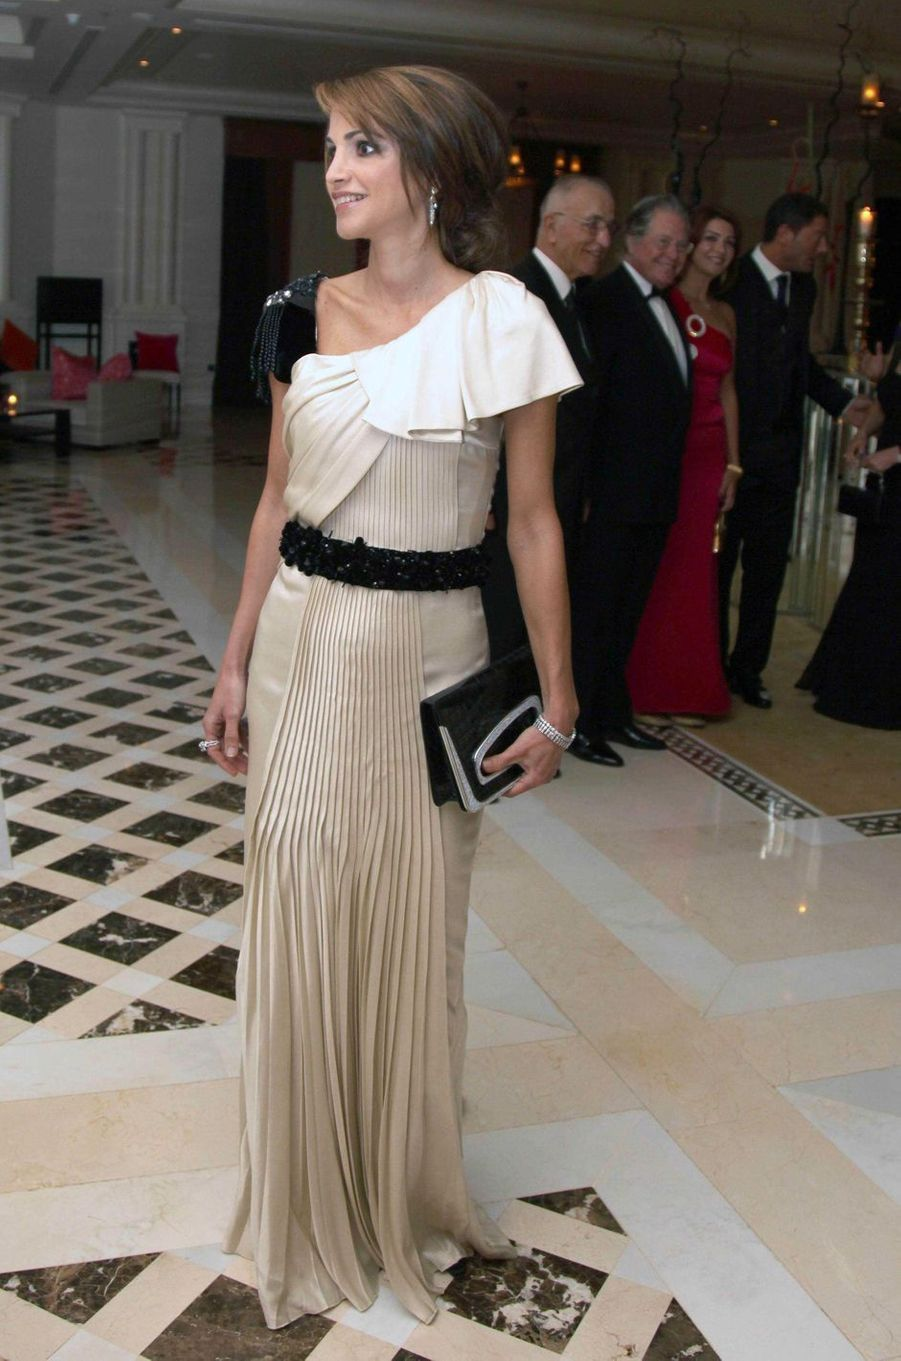 La reine Rania de Jordanie en Jordanie, le 25 novembre 2010